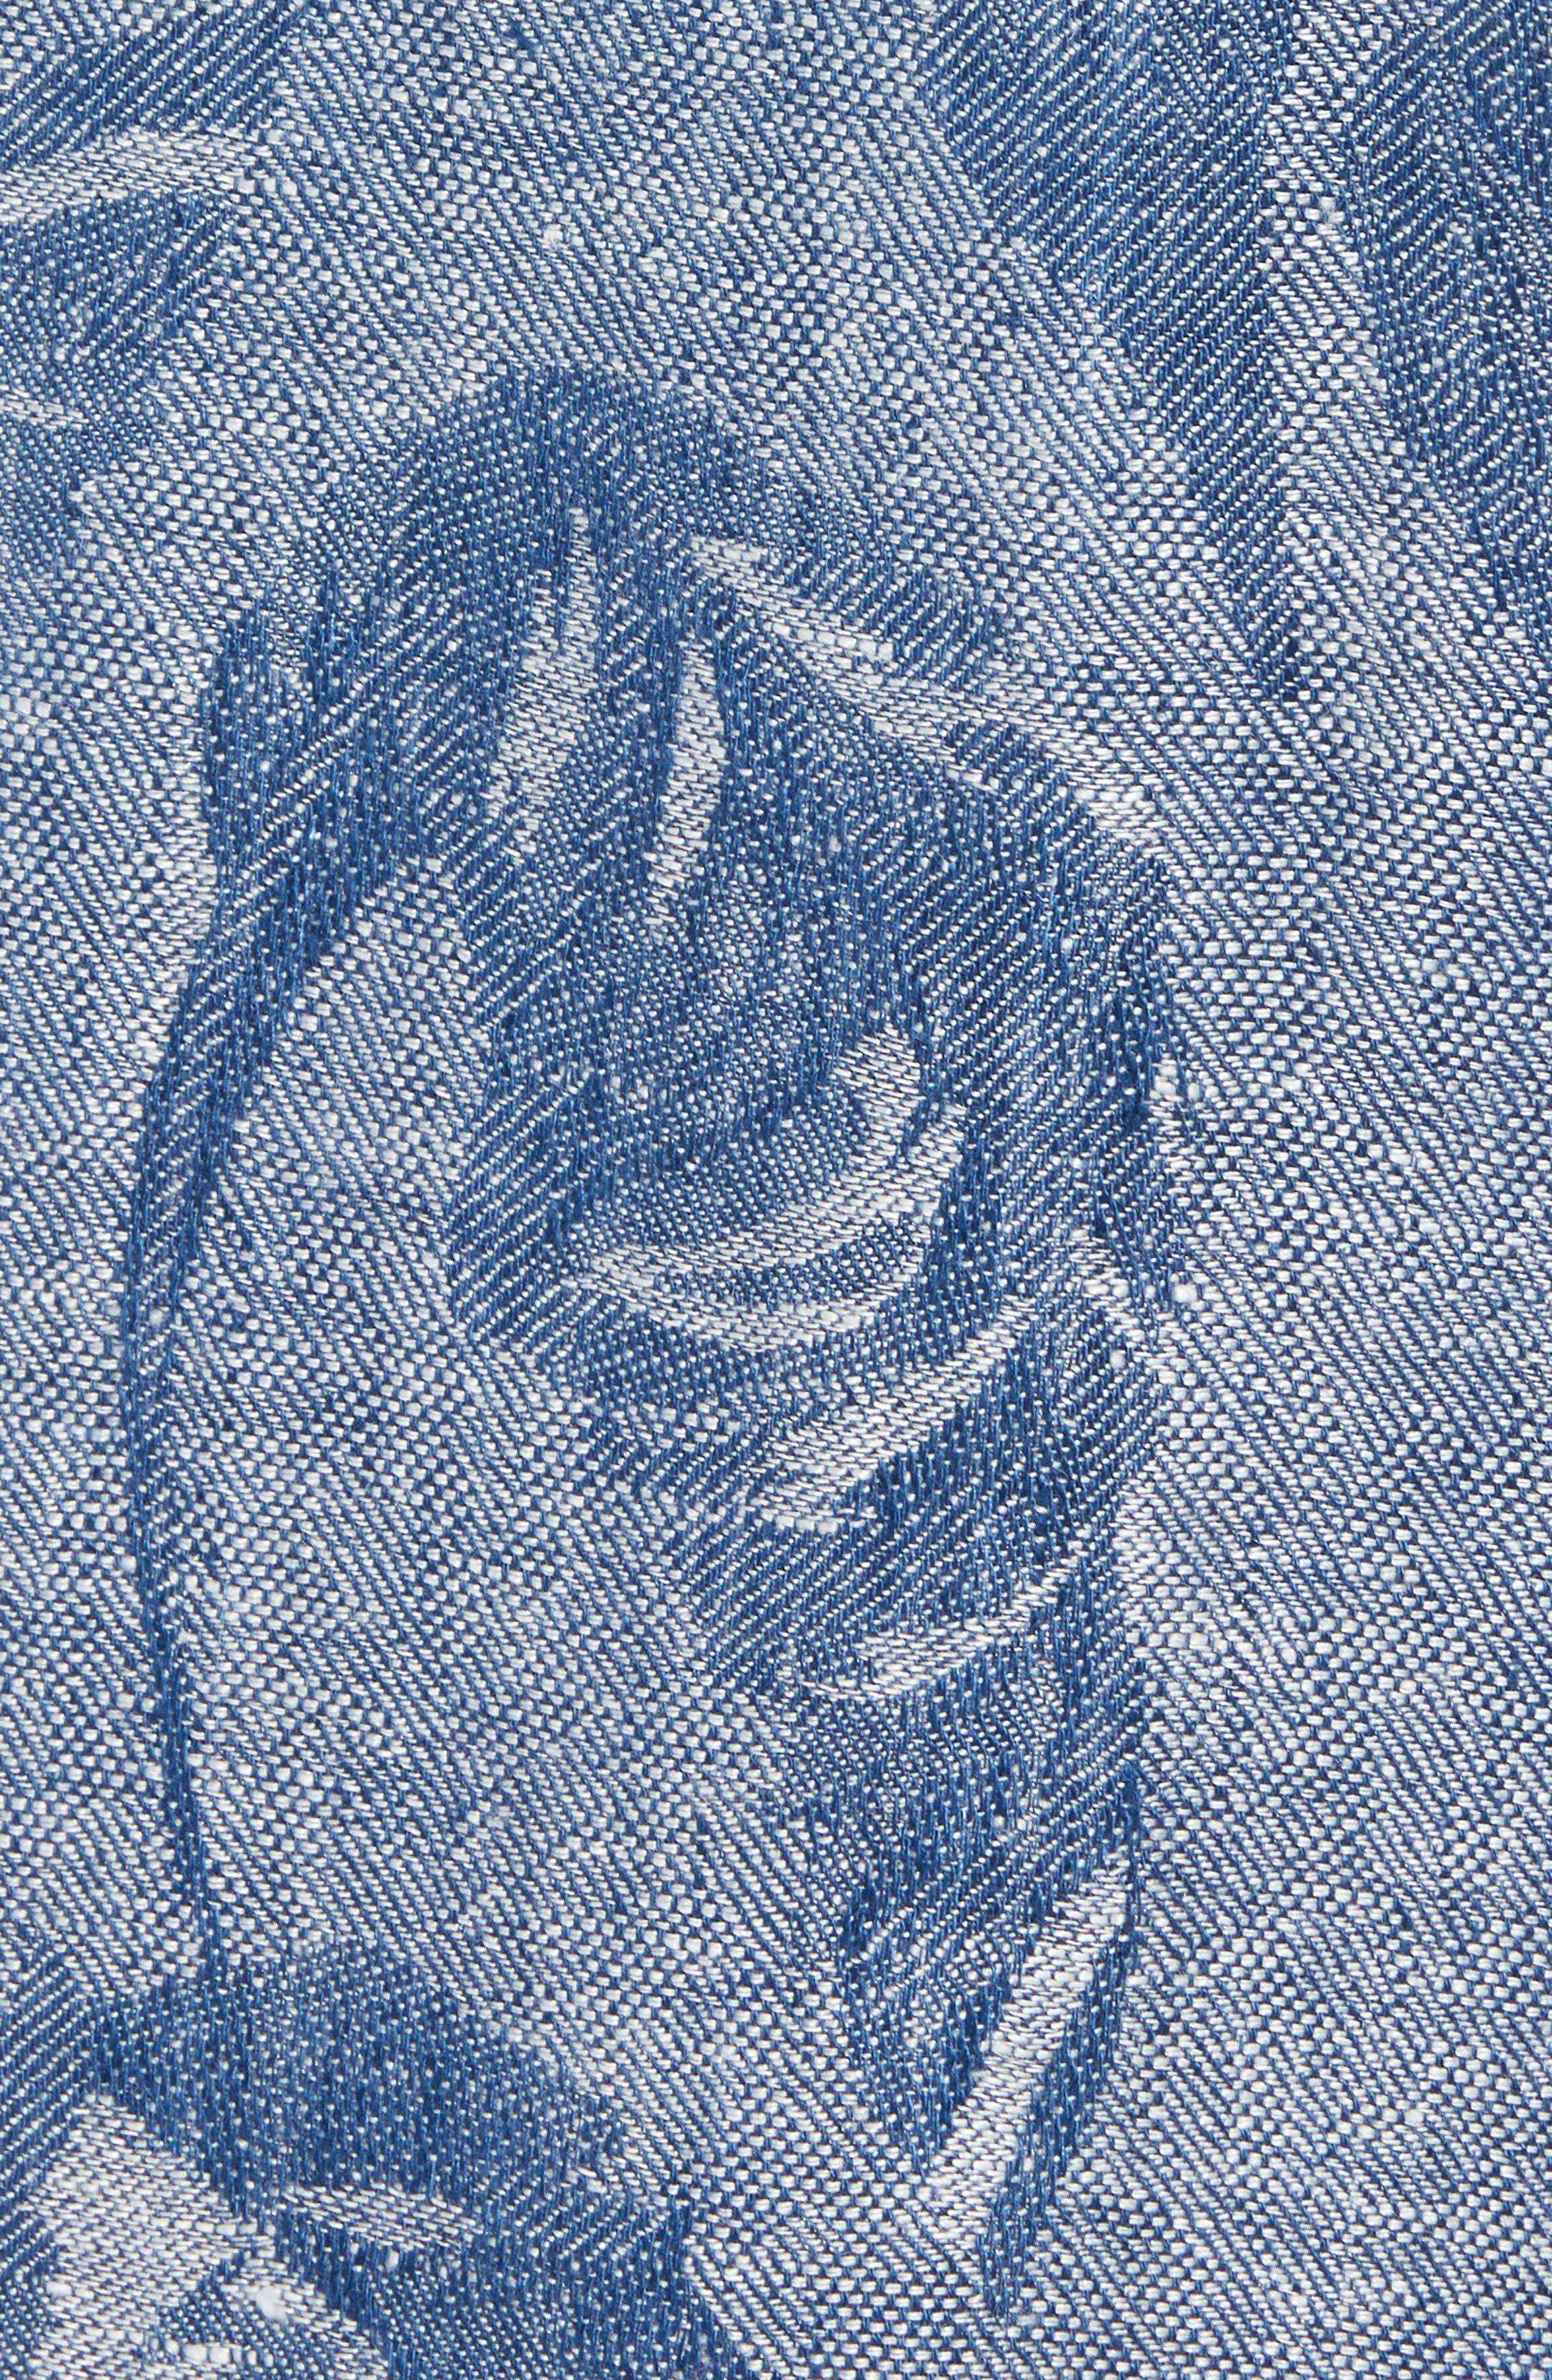 Help Me Fronda Linen Camp Shirt,                             Alternate thumbnail 5, color,                             401